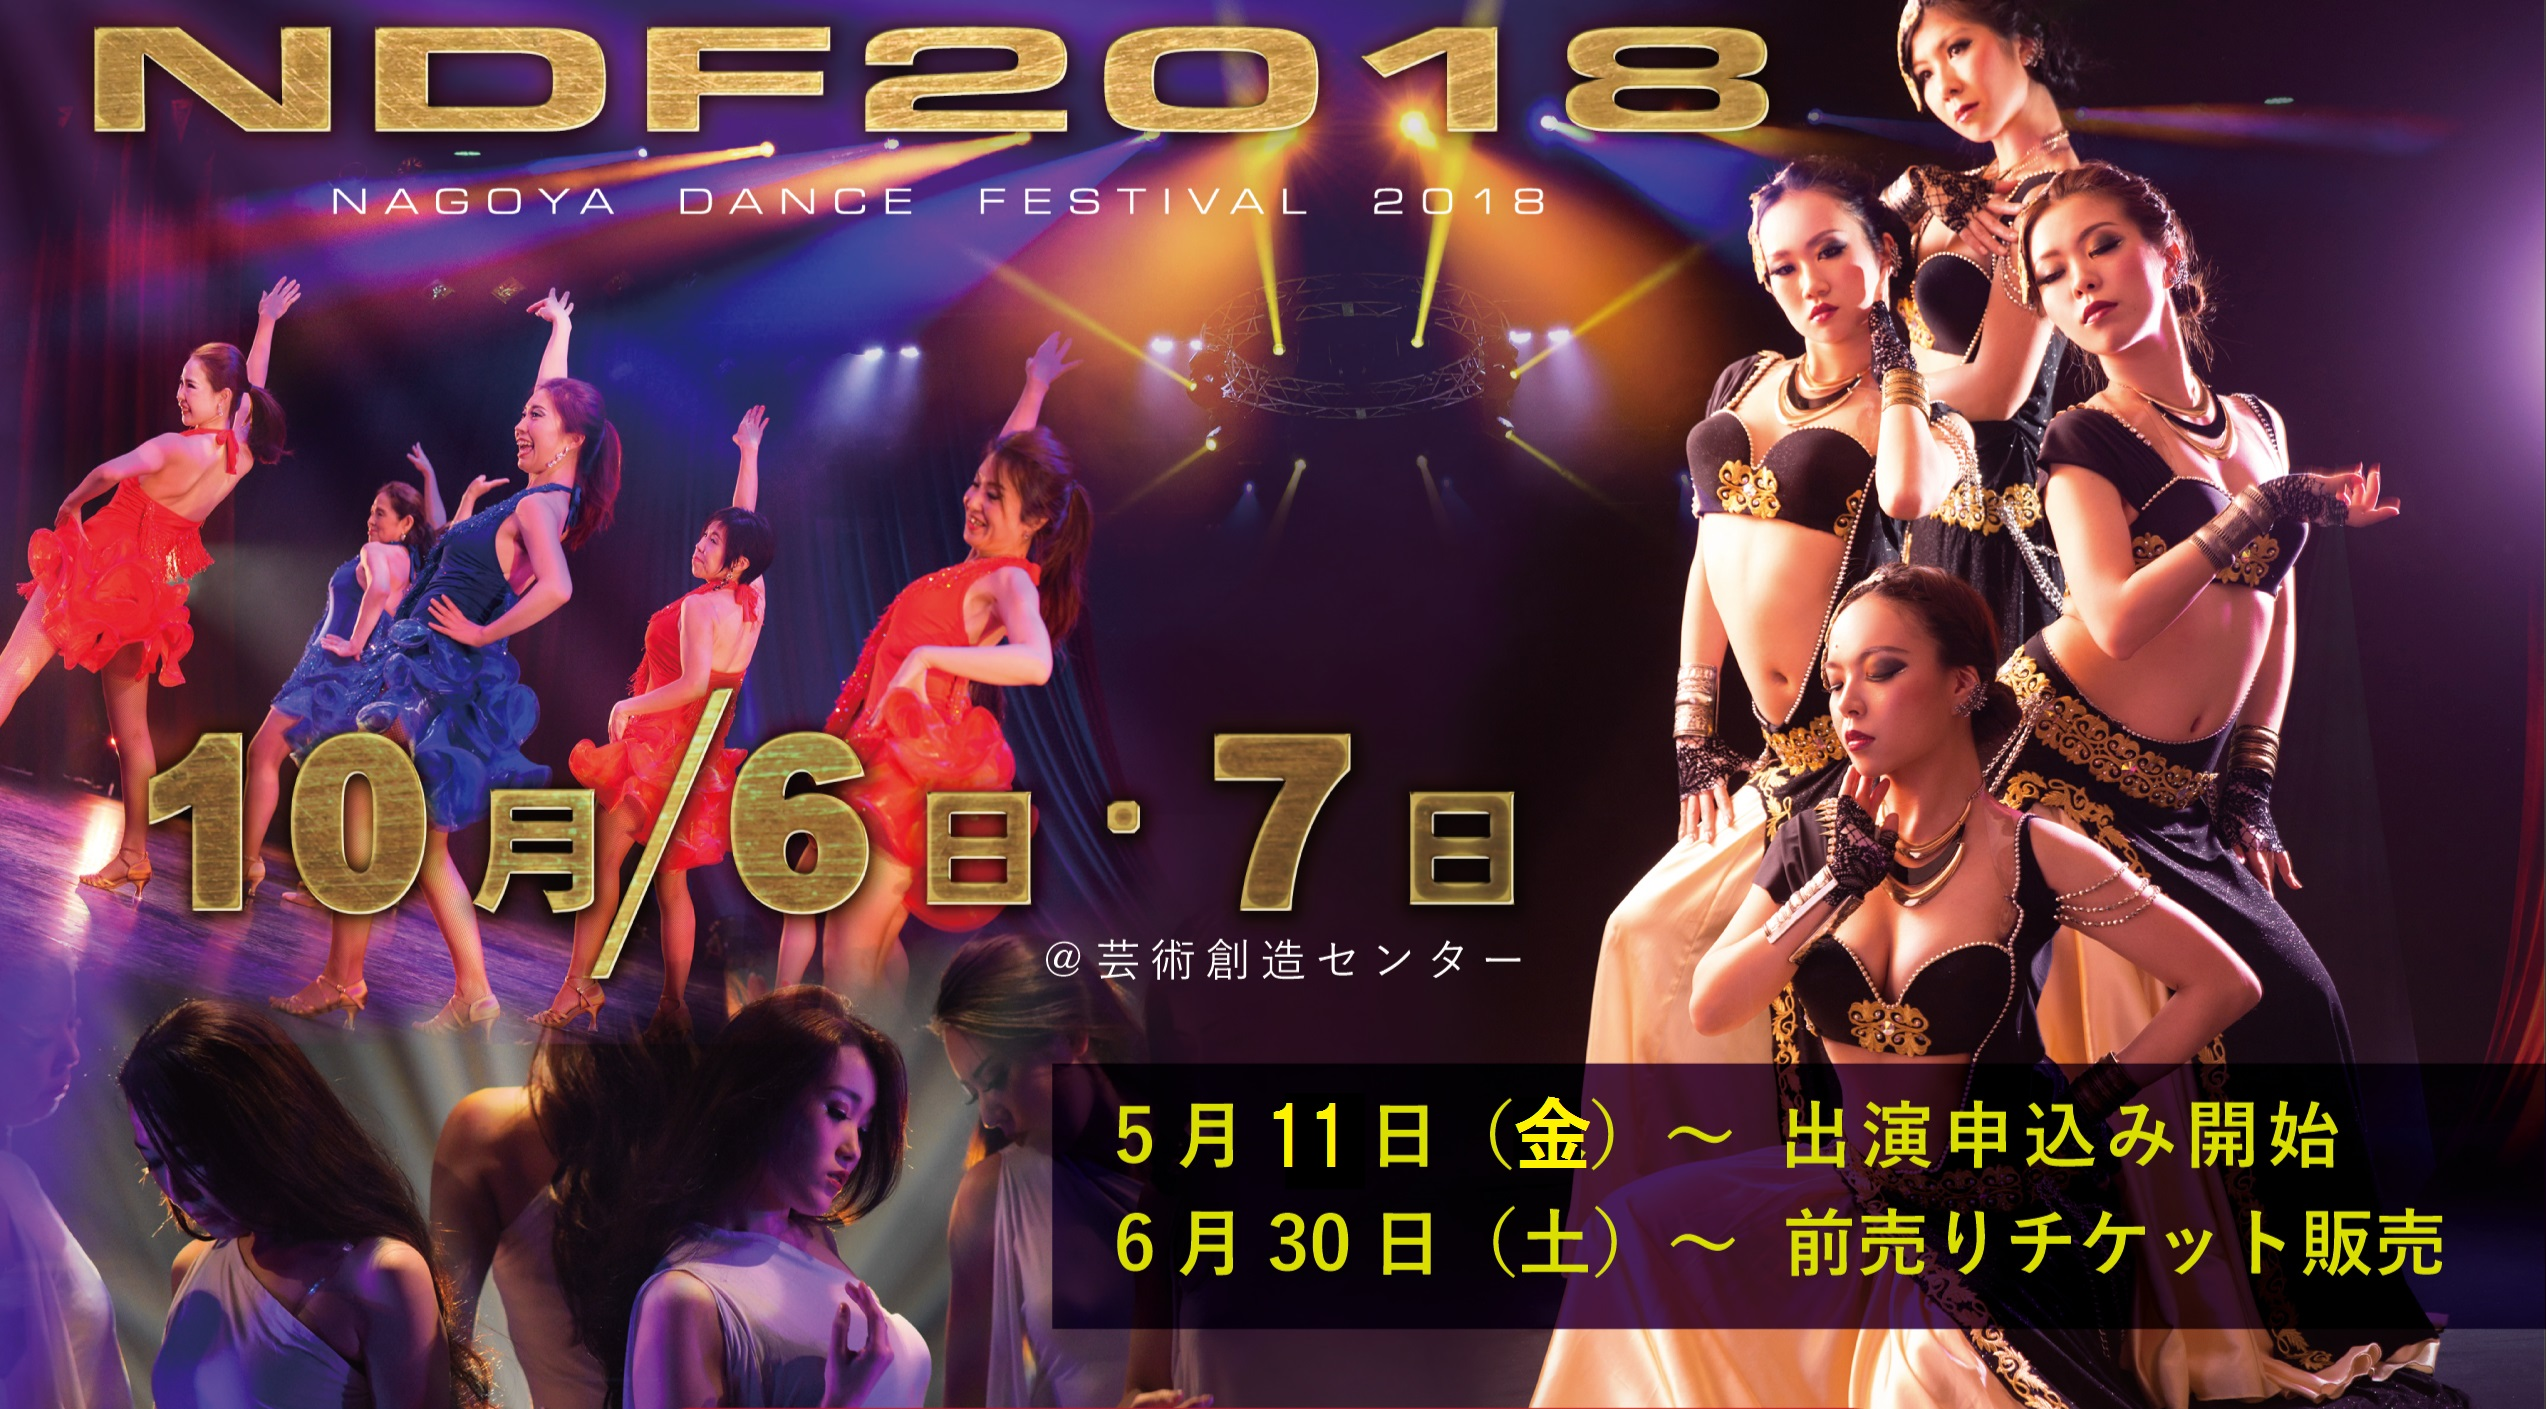 Nagoya Dance Festival 2018に関するお知らせ☆